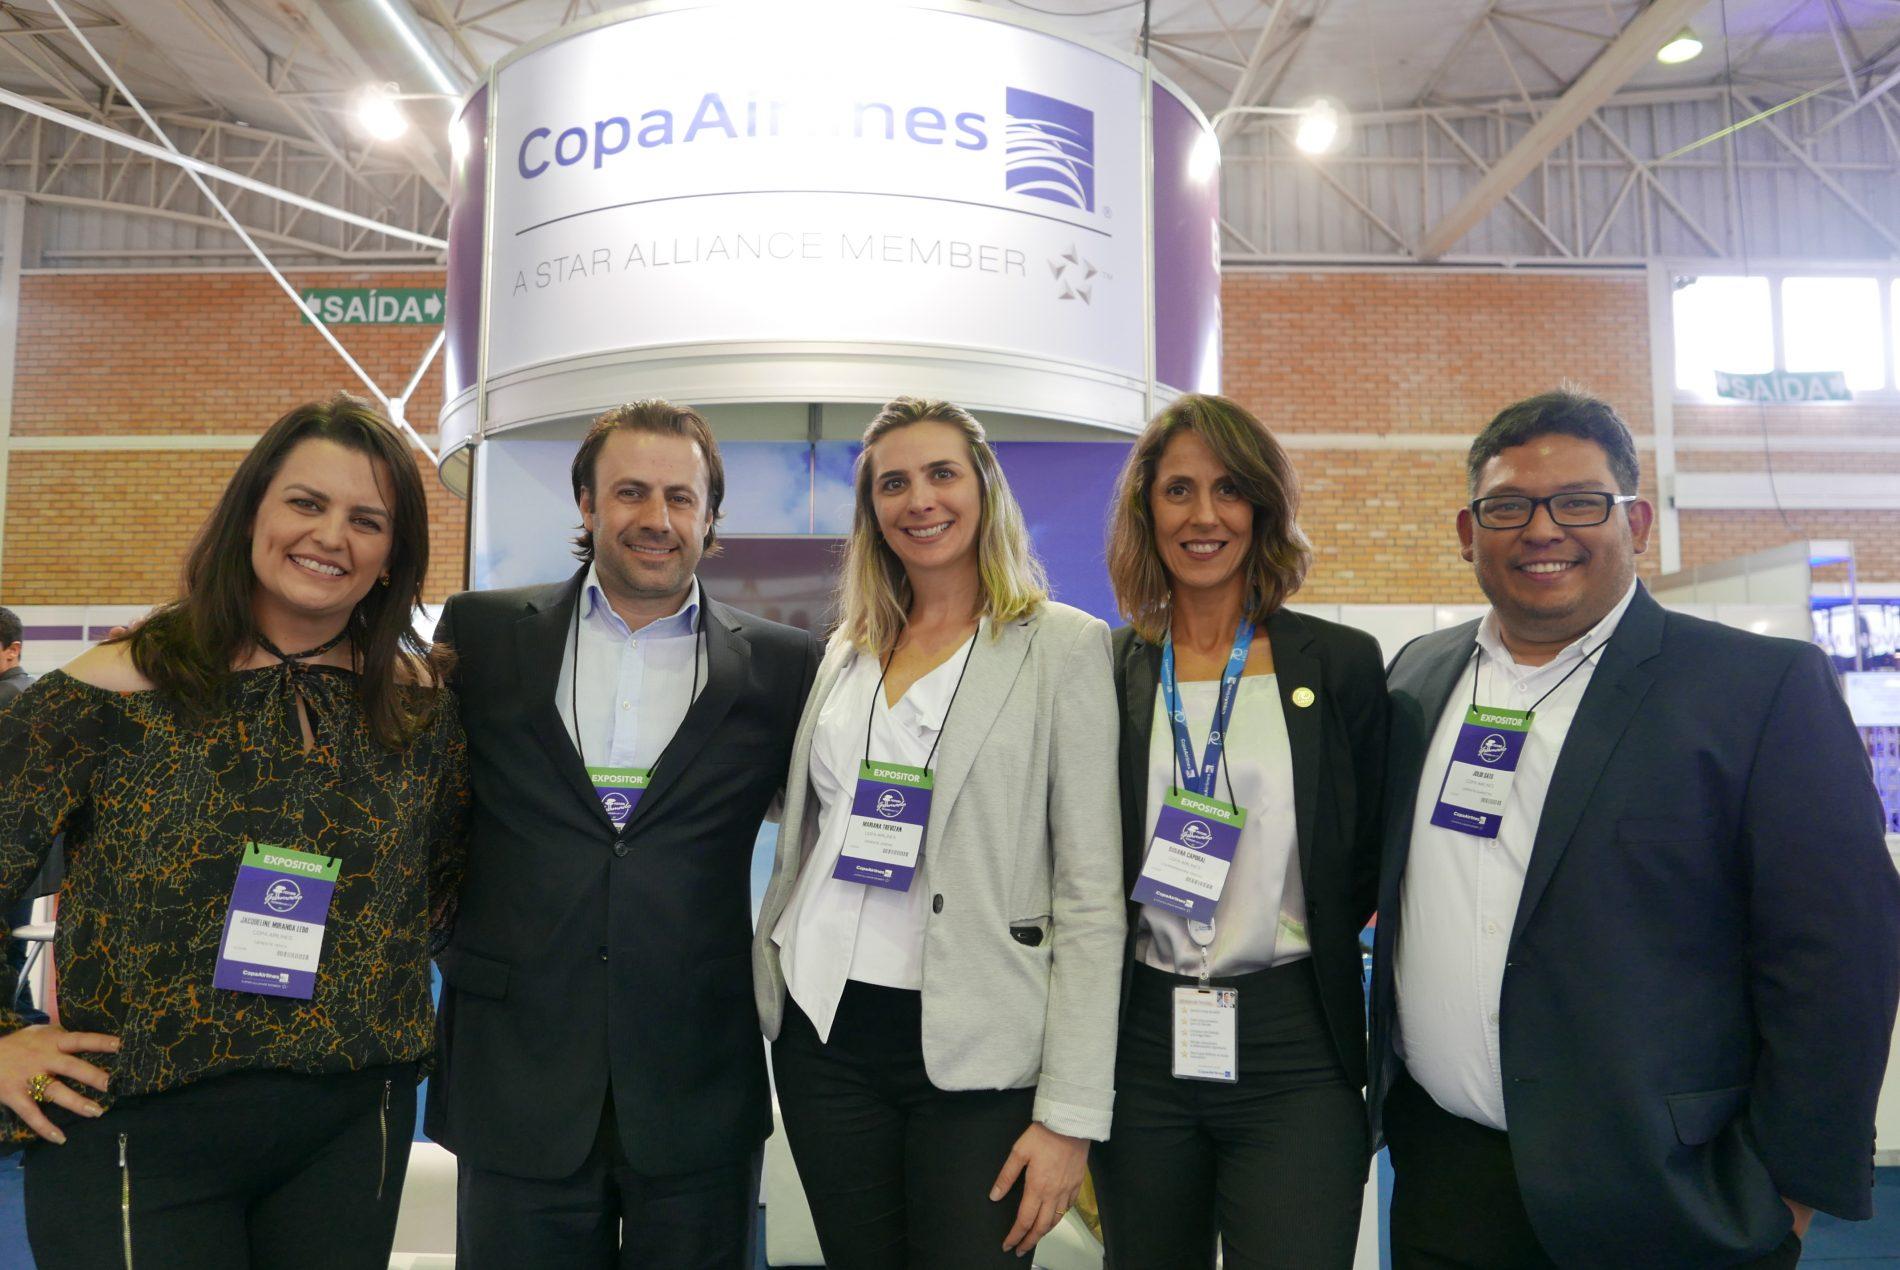 Jacqueline Ledo + Emerson Sanglard + Mariana Trevisan + Rosana Caporal + Julio Sato = a super equipe da Copa Airlines, no estande da companhia